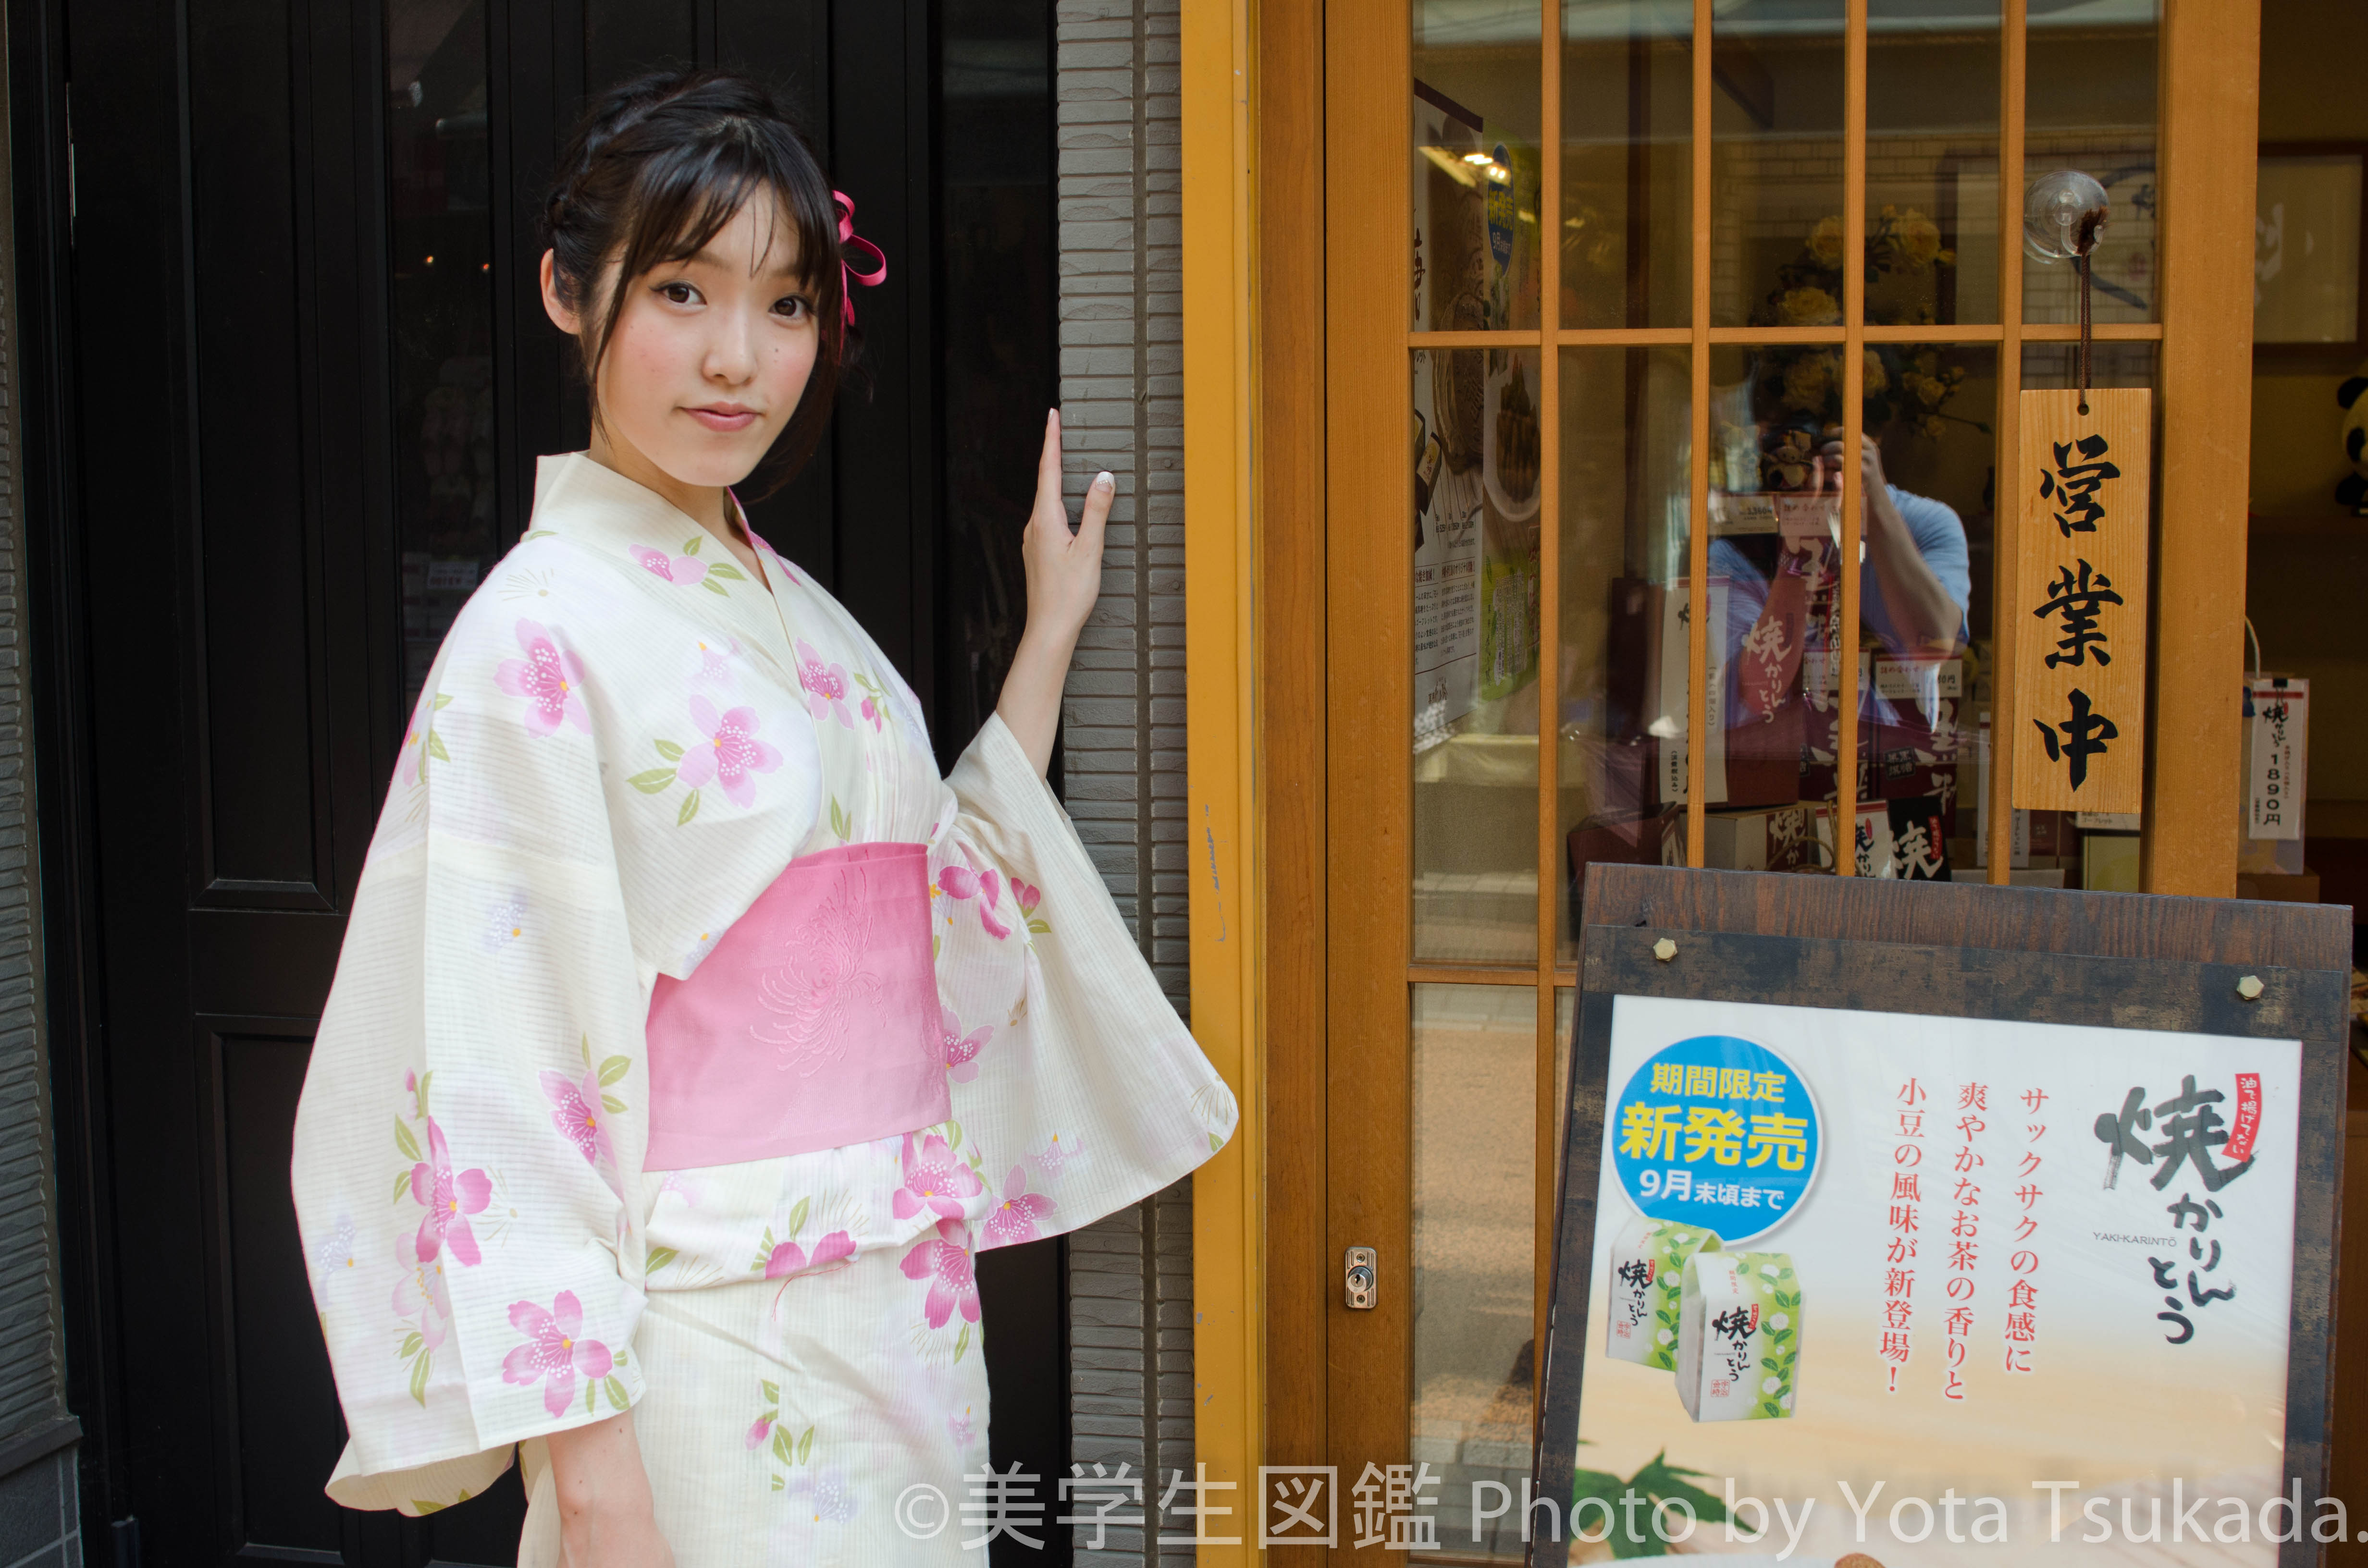 オフショット#163 細谷 夏生 @東京大学★浴衣美女特集